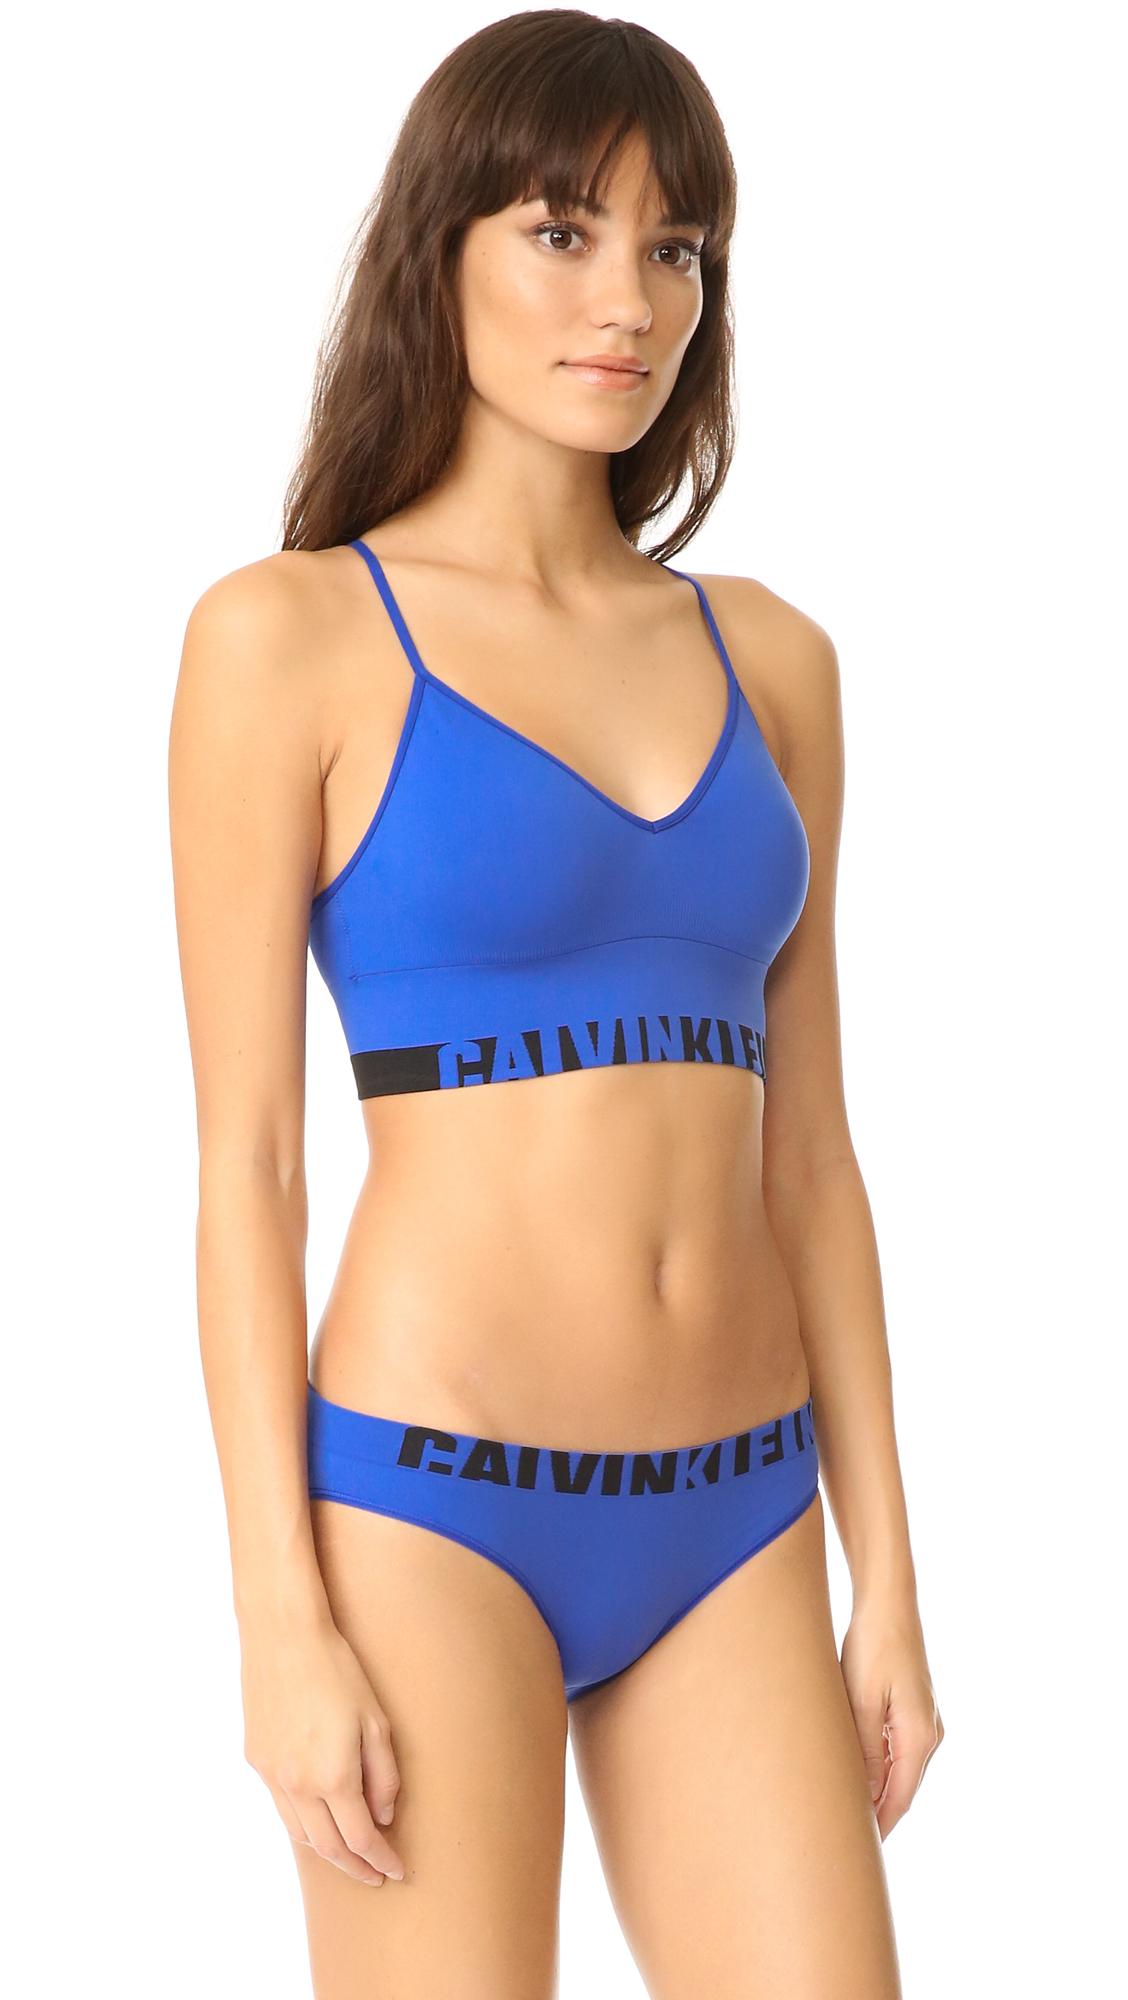 e58a7f4f3 Calvin Klein Underwear Seamless Logo Multi Way Bralette